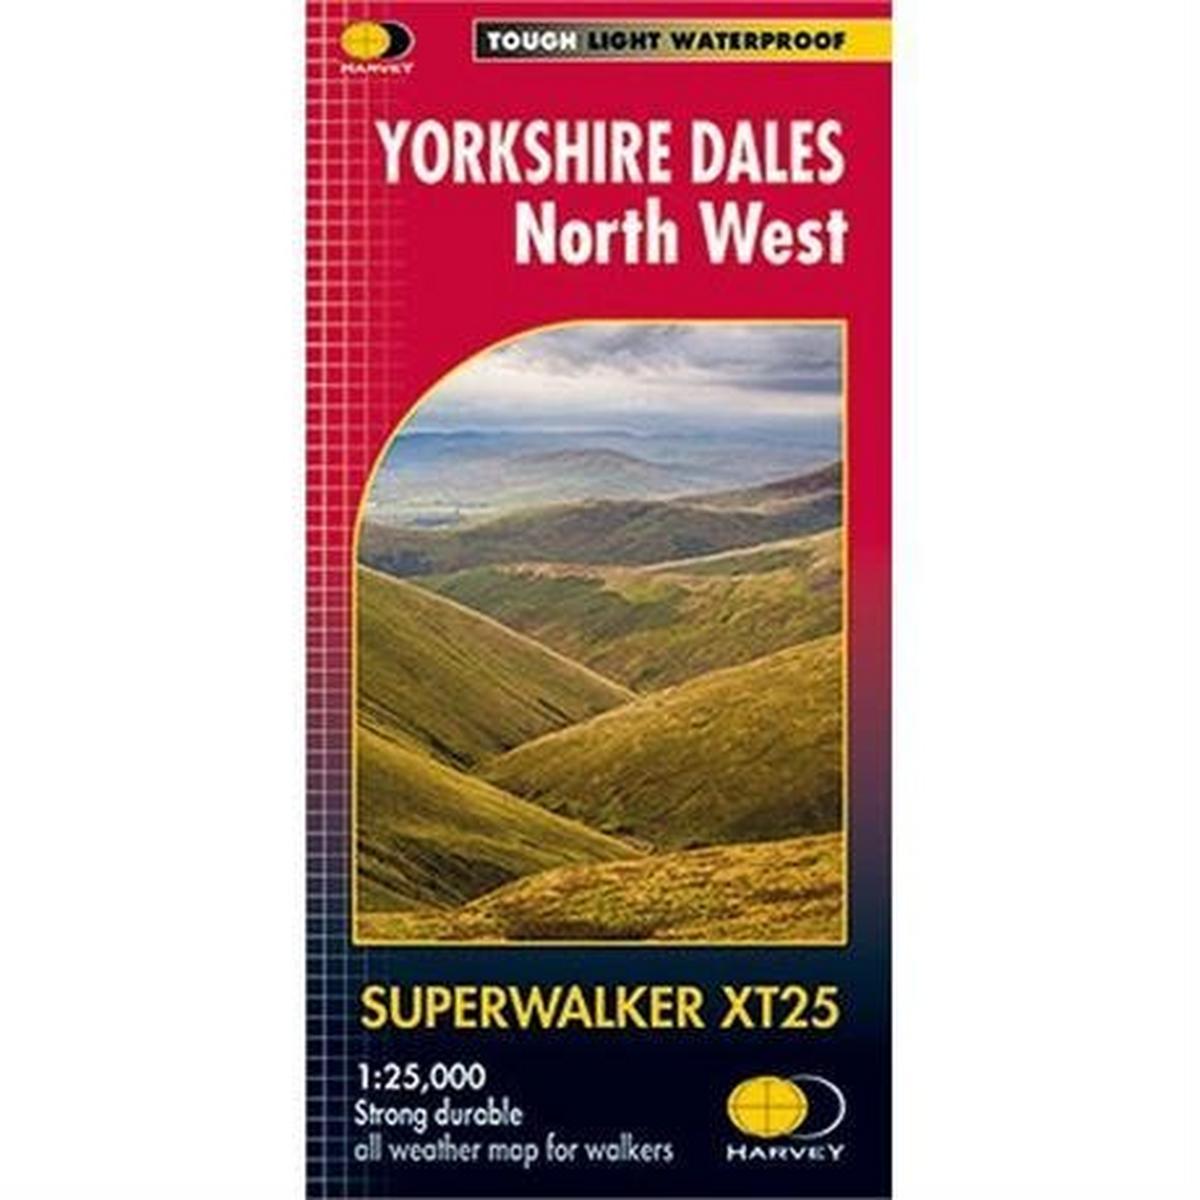 Harveys Harvey Map - Superwalker XT25: Yorkshire Dales North West